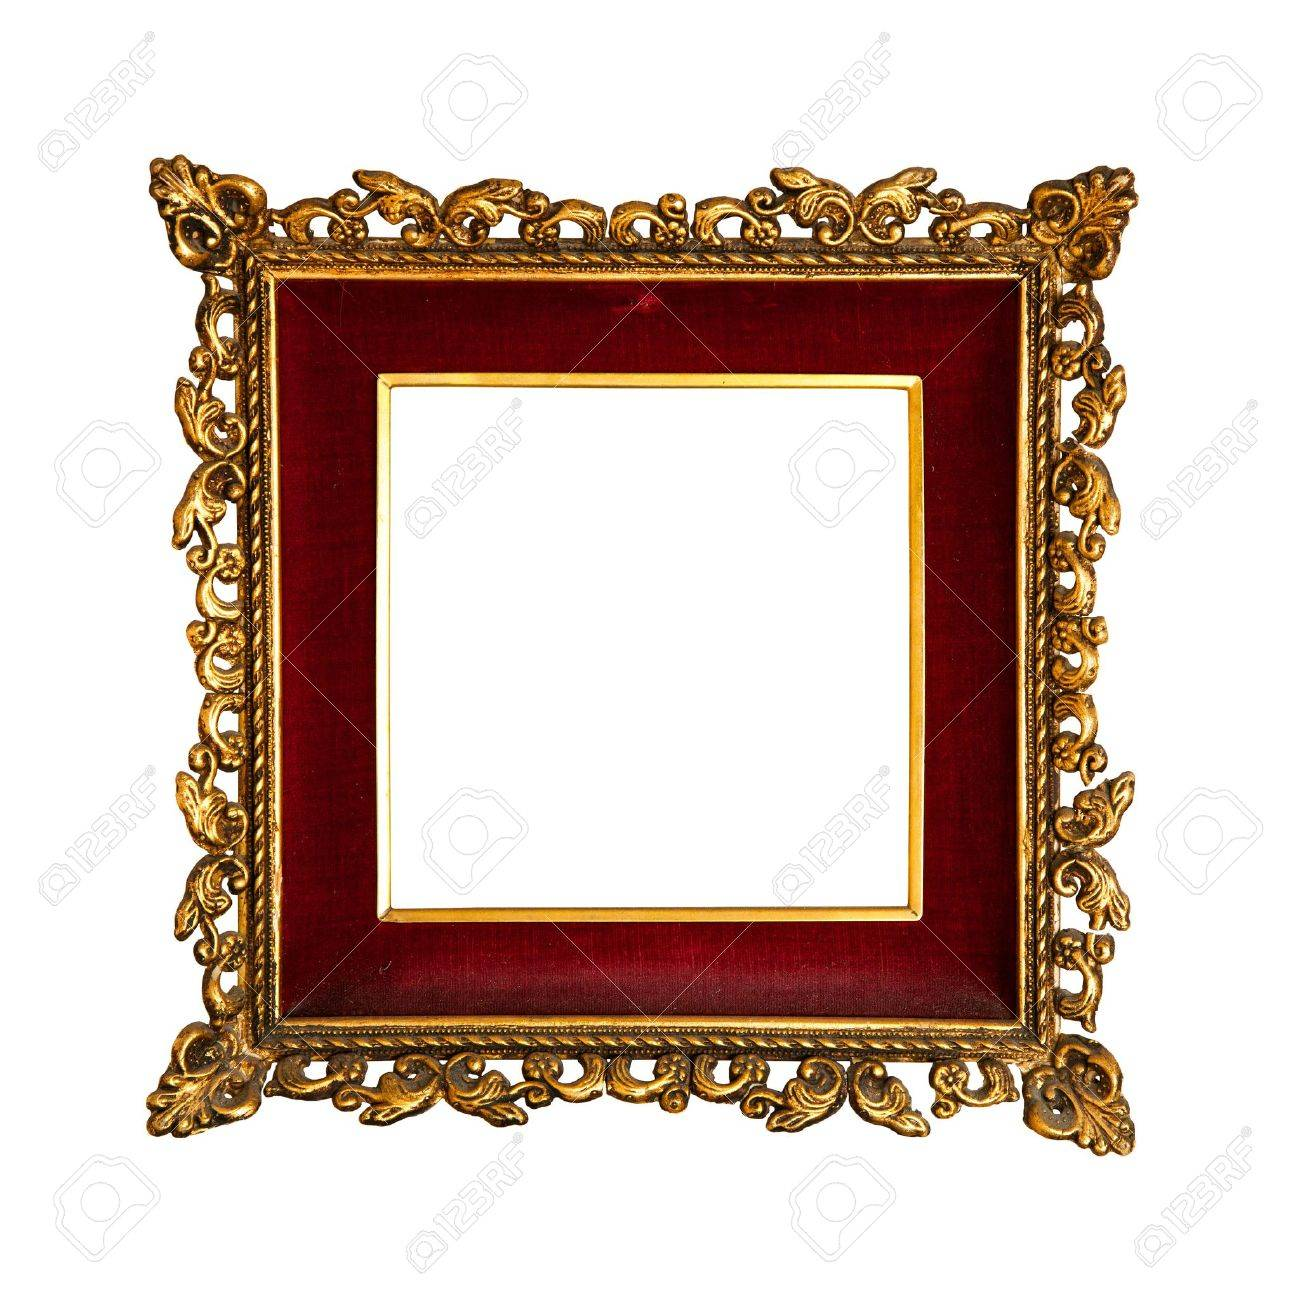 old  golden retro frame, with red velvet, baroque style Stock Photo - 9657178